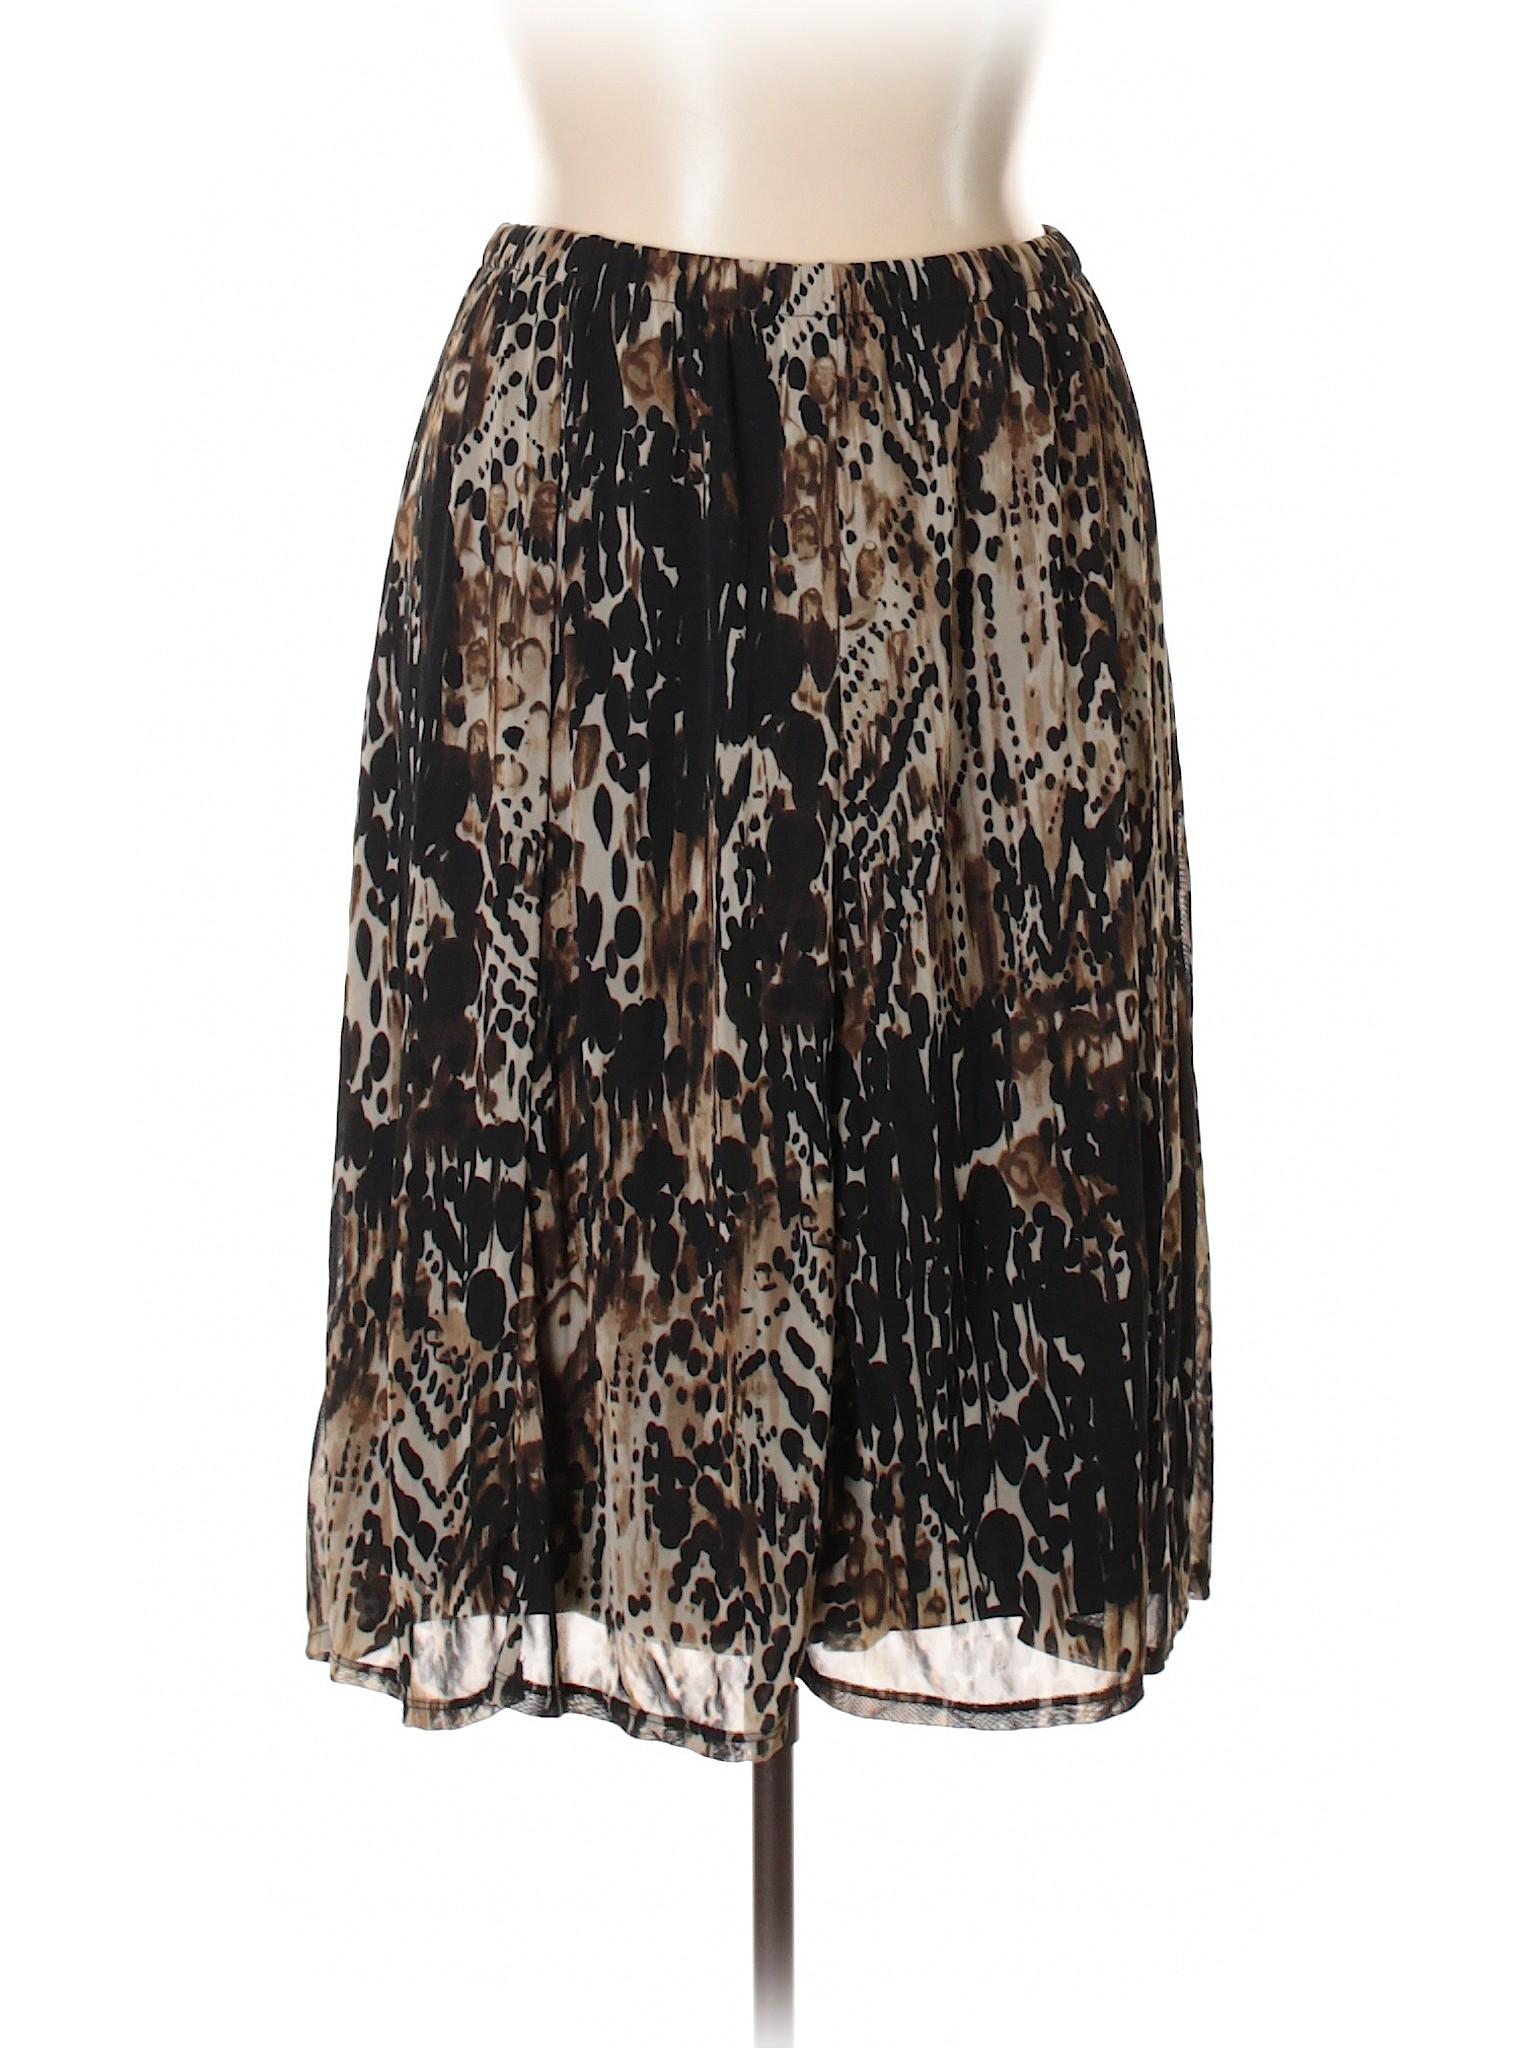 Skirt Casual Casual Boutique Skirt Casual Skirt Skirt Boutique Boutique Boutique Boutique Casual Casual Skirt Boutique Skirt Casual xARwExfS